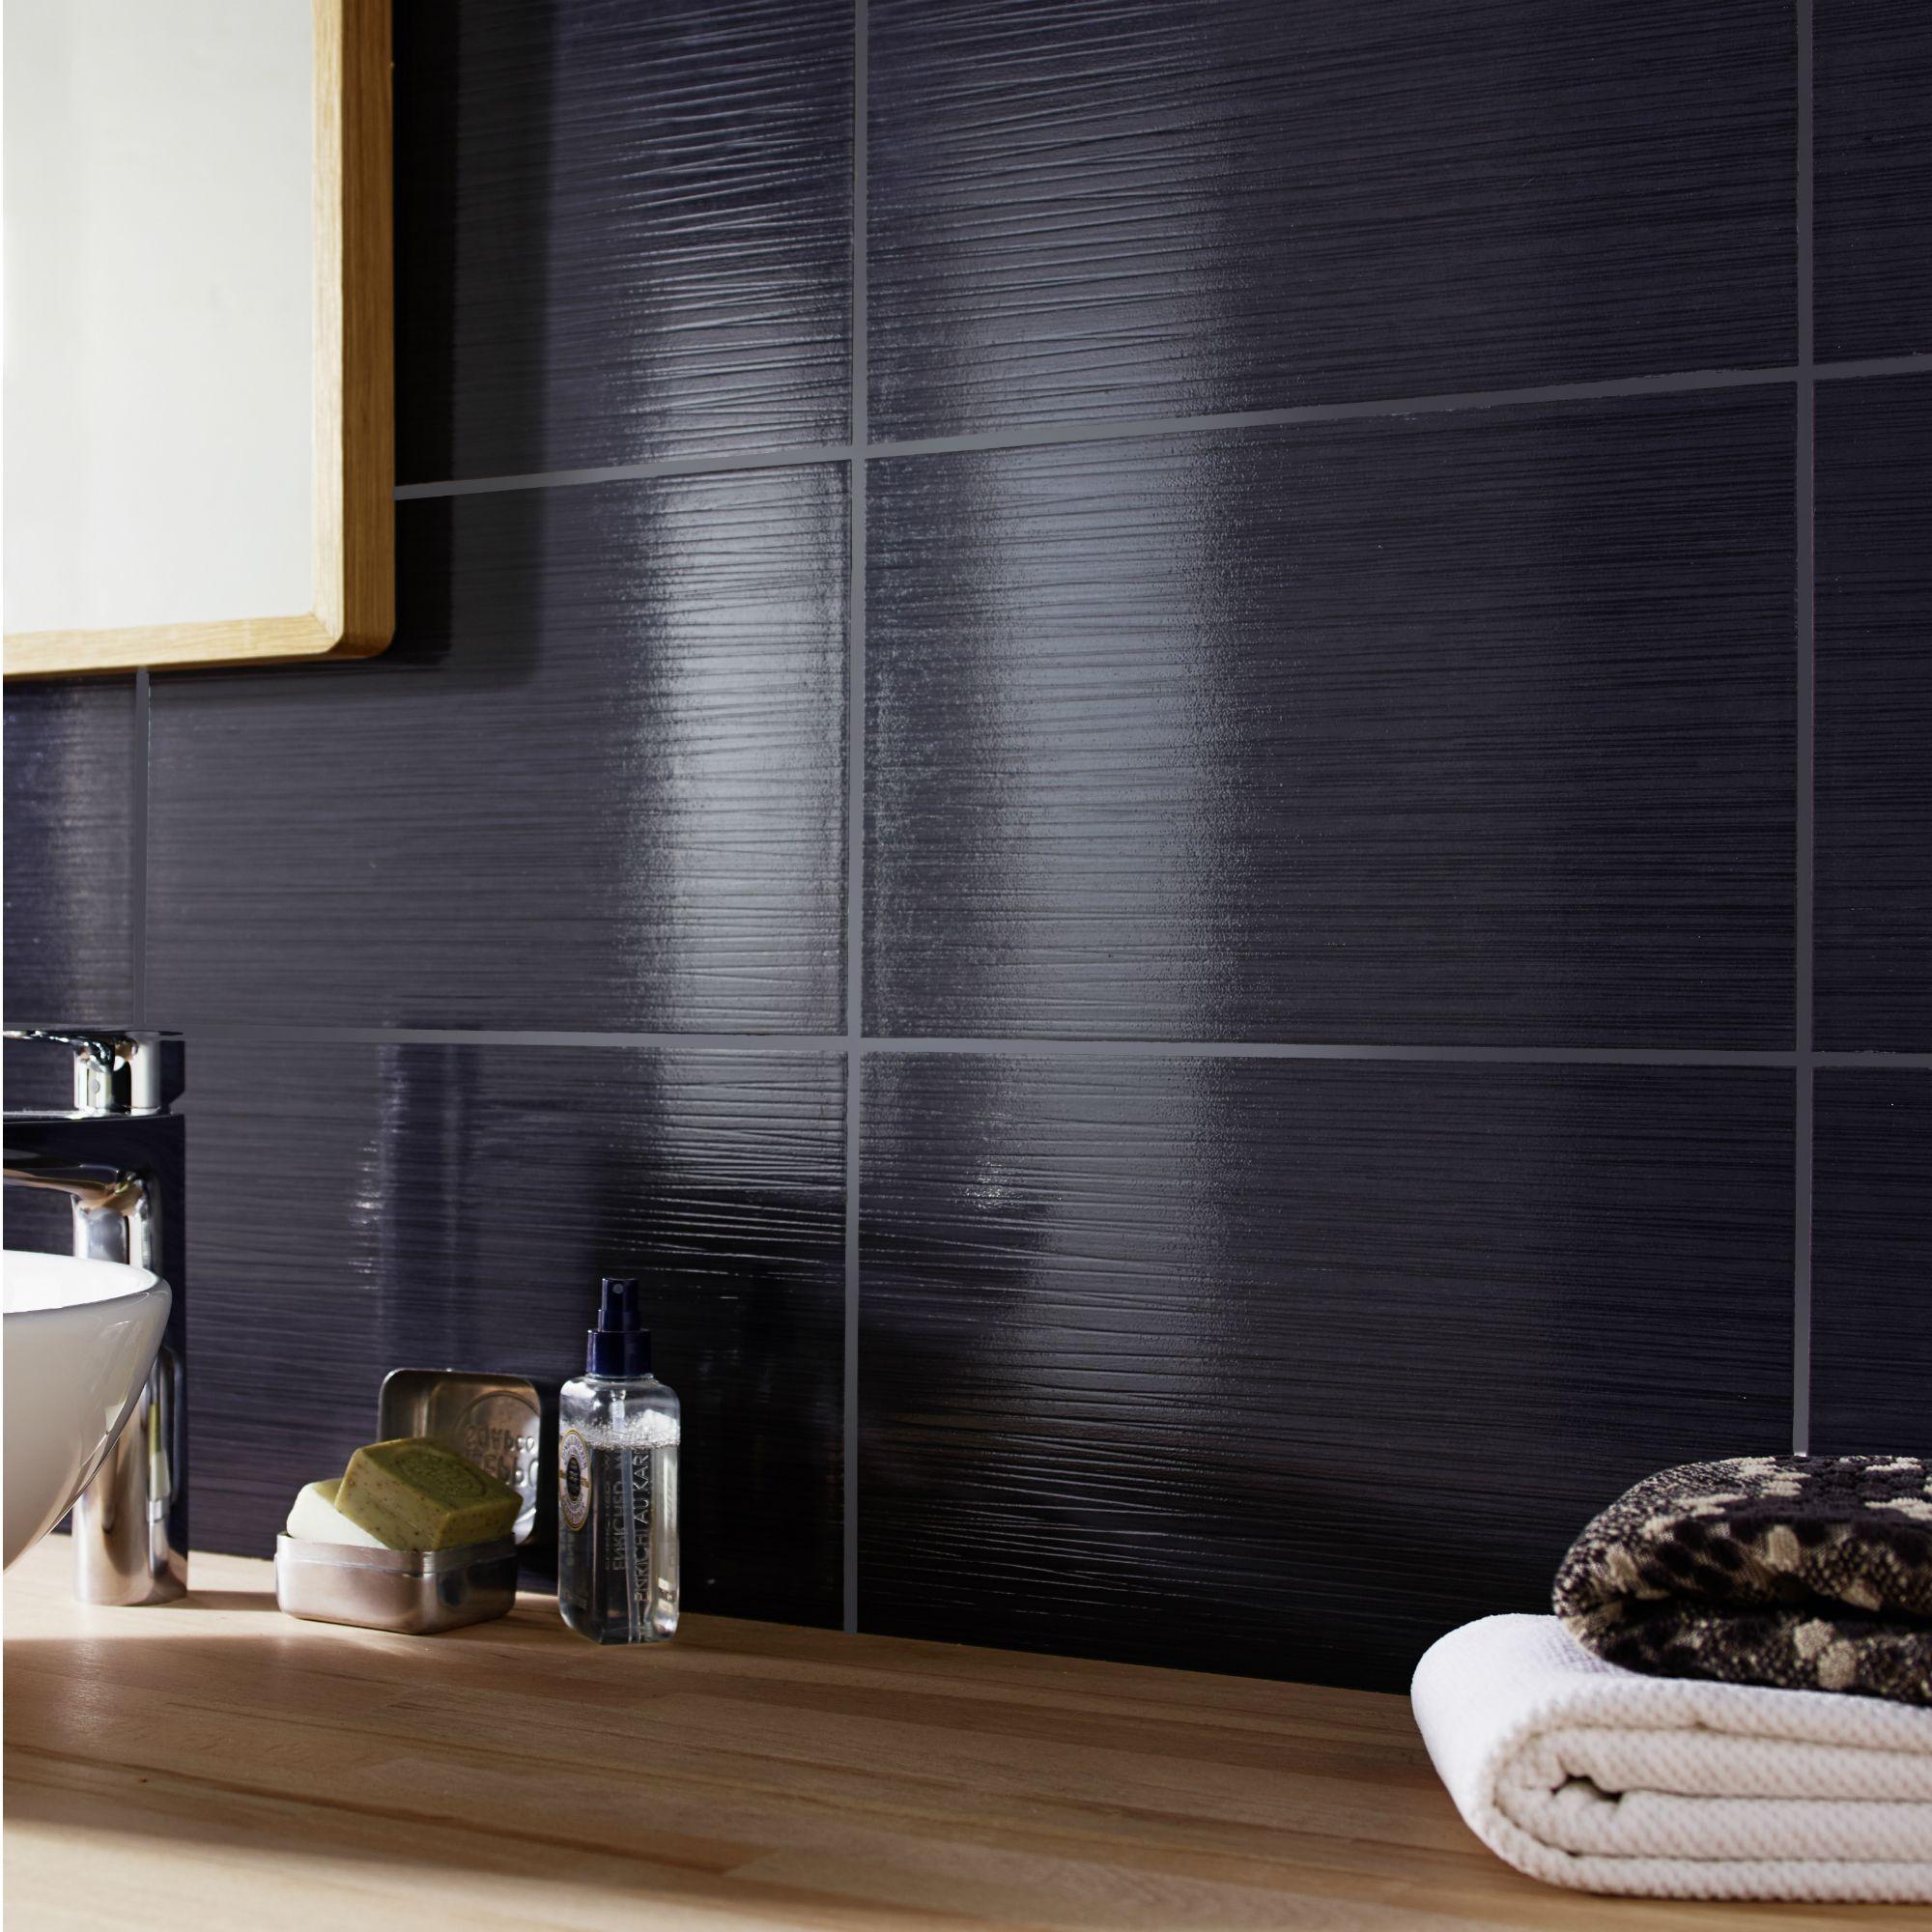 Salerna Black Gloss Ceramic Wall tile, Pack of 17, (L ...